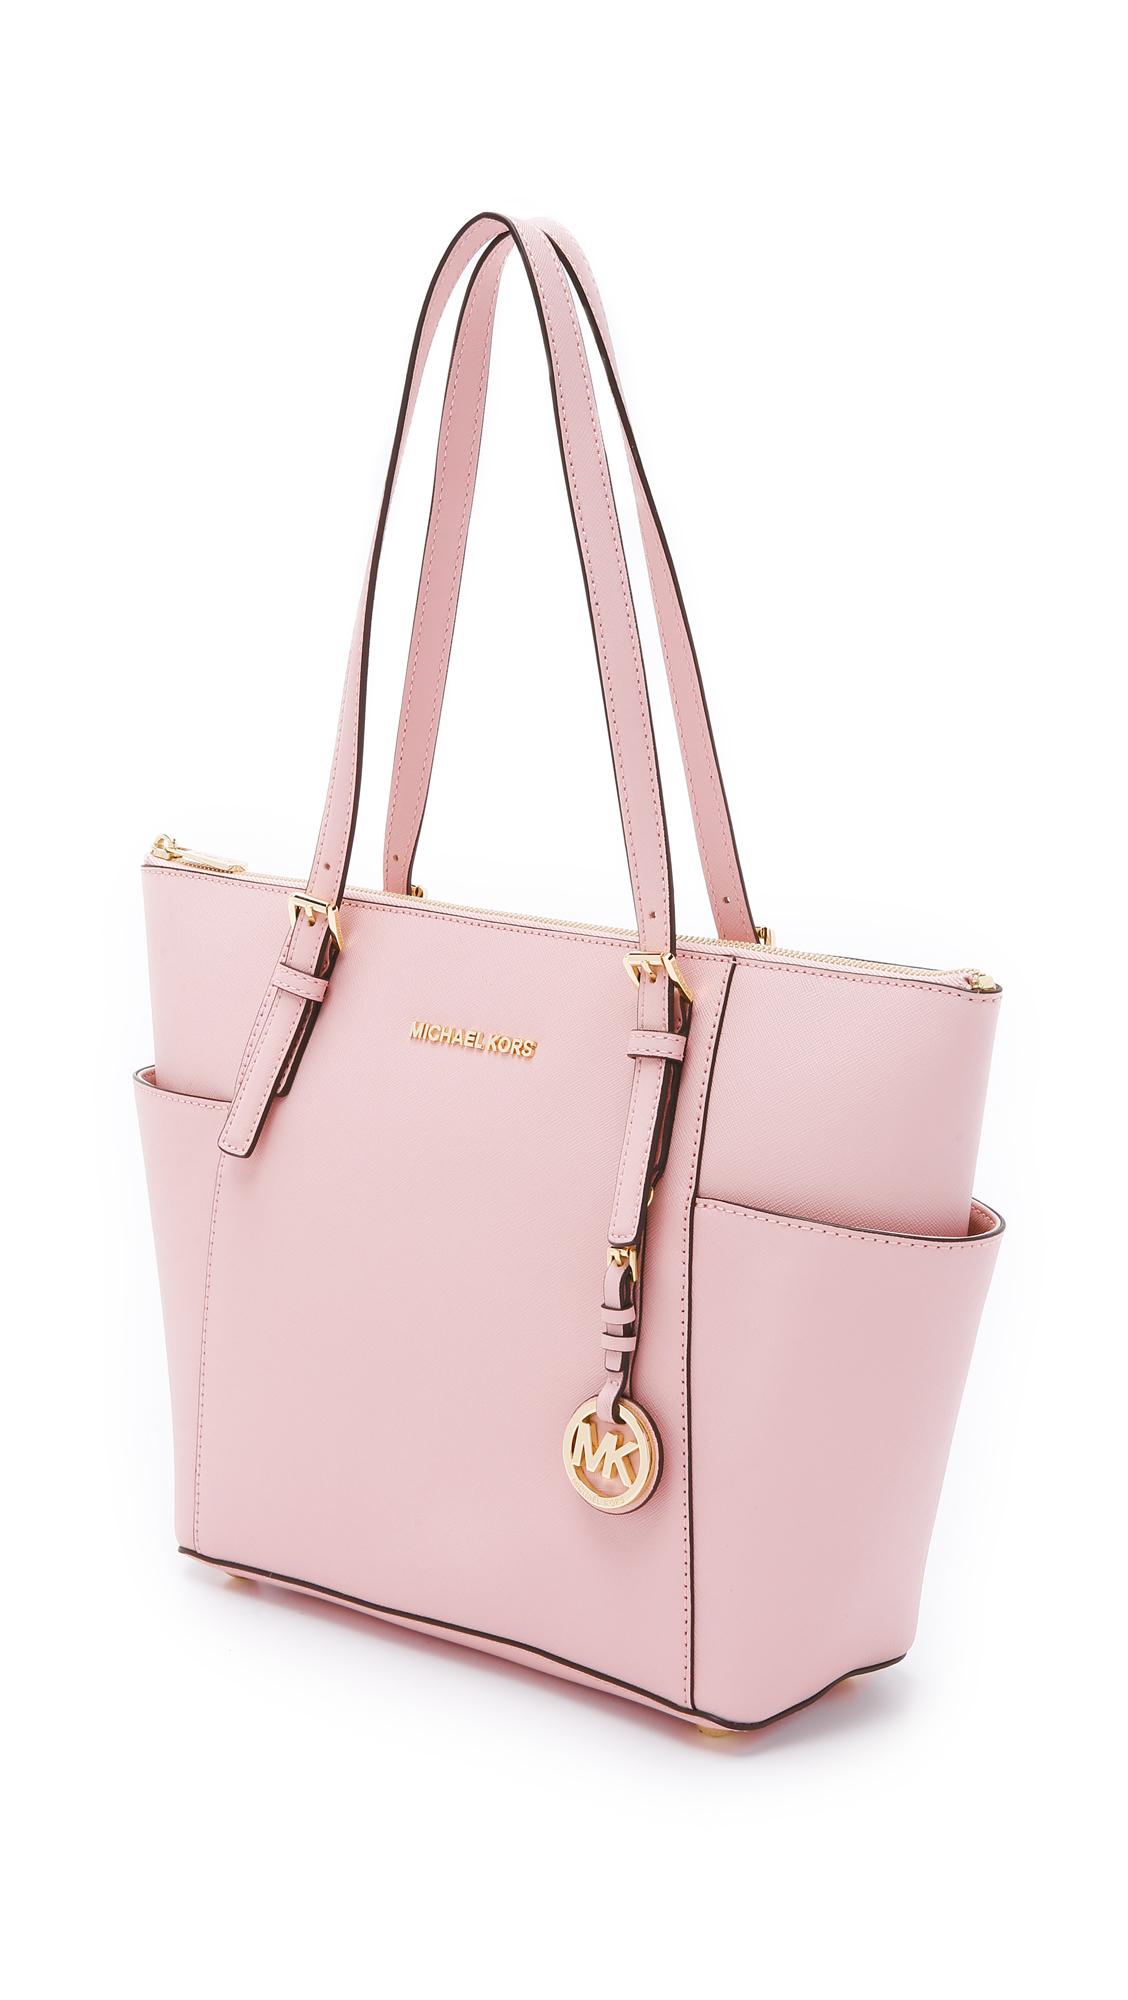 280567a2e258 MICHAEL Michael Kors Jet Set Top-zip Saffiano Tote Bag in Pink - Lyst